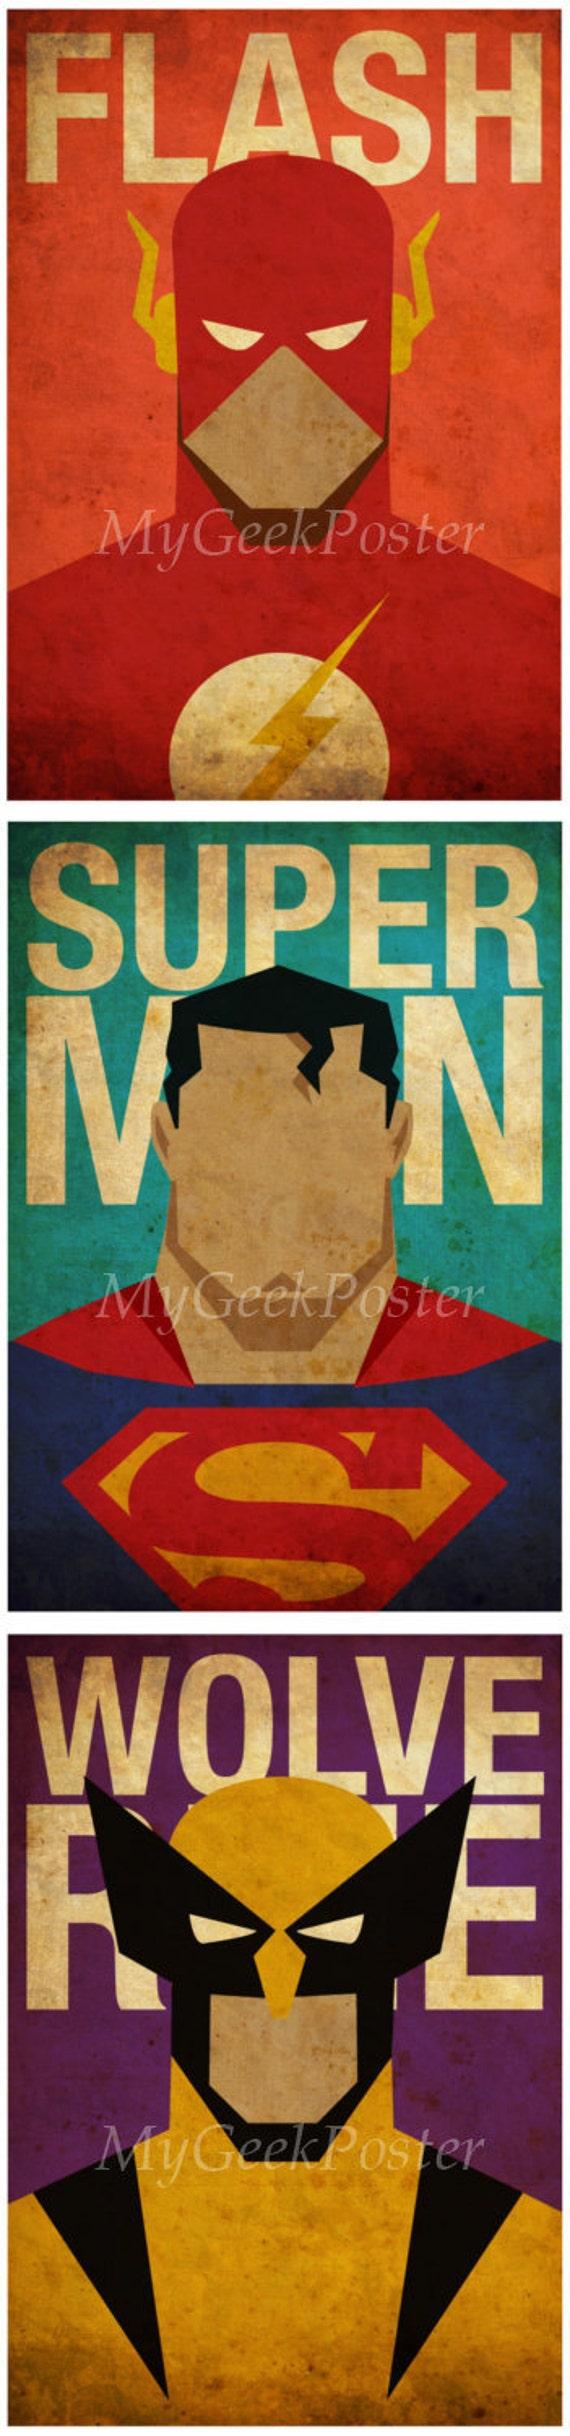 Series 2 Minimalist Superheroes Vintage Poster Set of 6 Prints